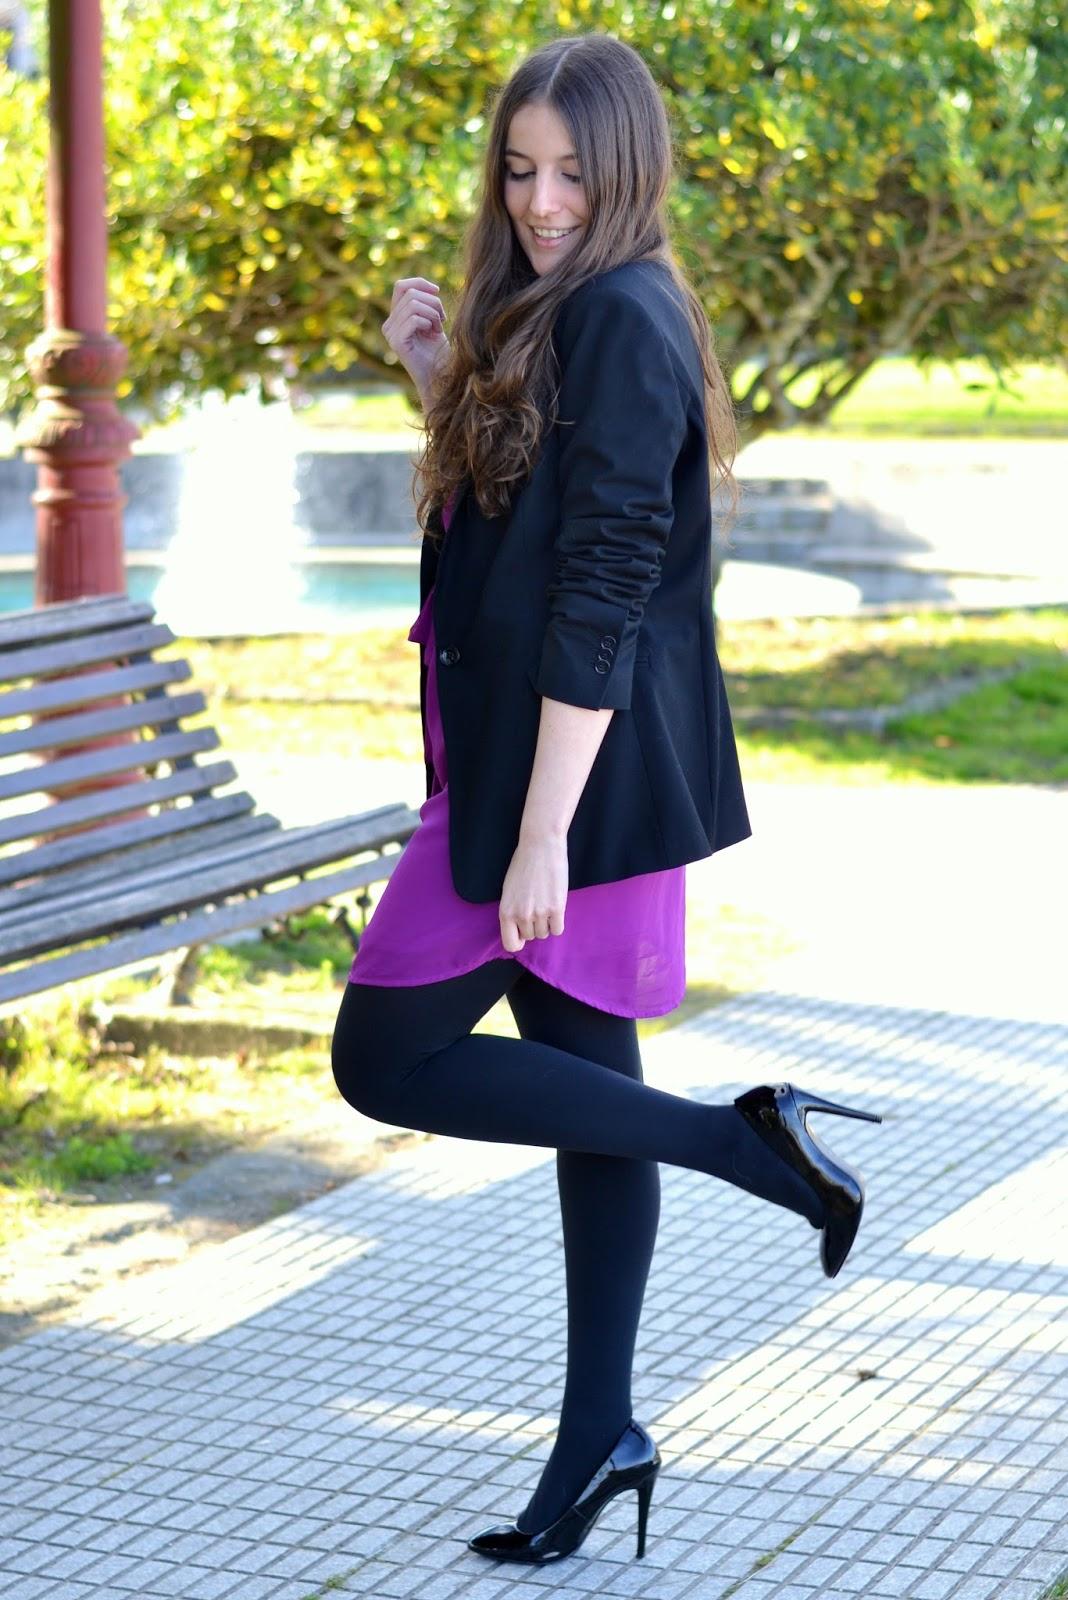 Pantyhose heels blogs